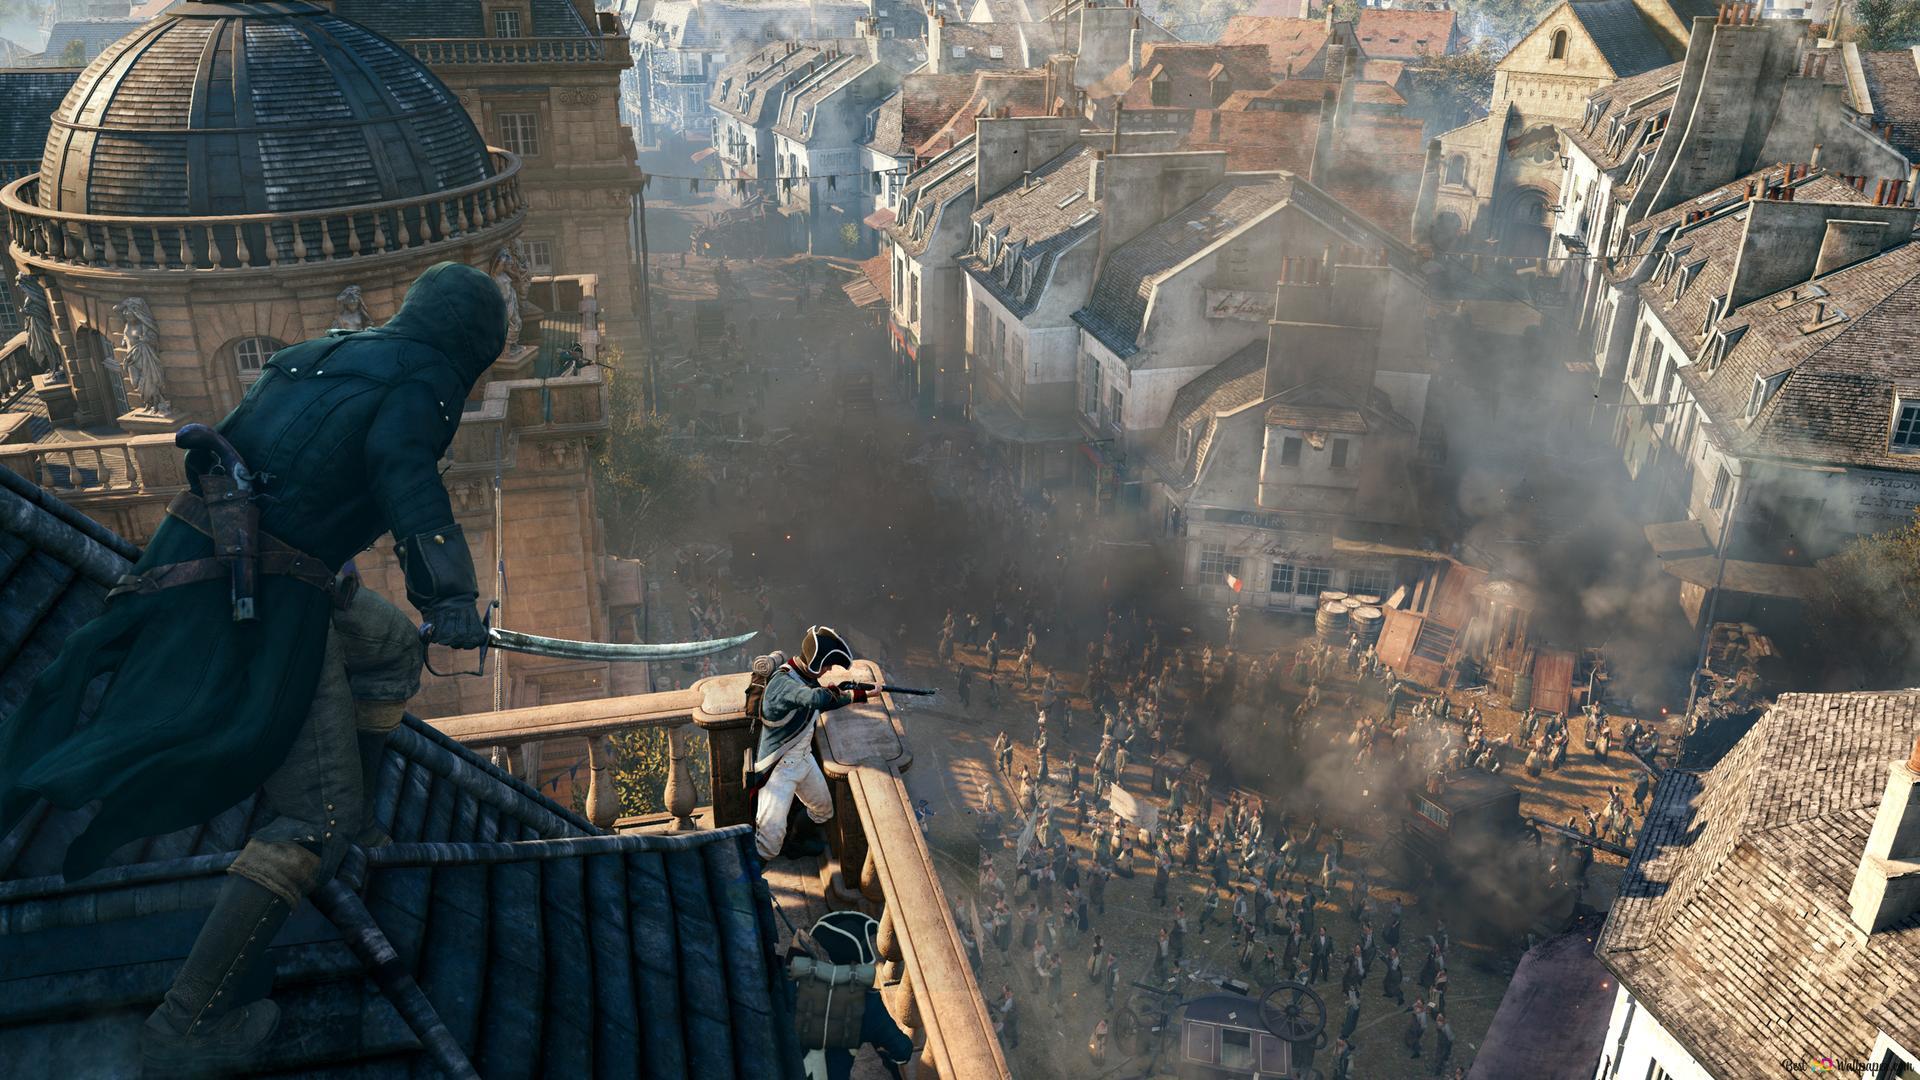 Assassin S Creed Unity Battle In Paris Hd Wallpaper Download